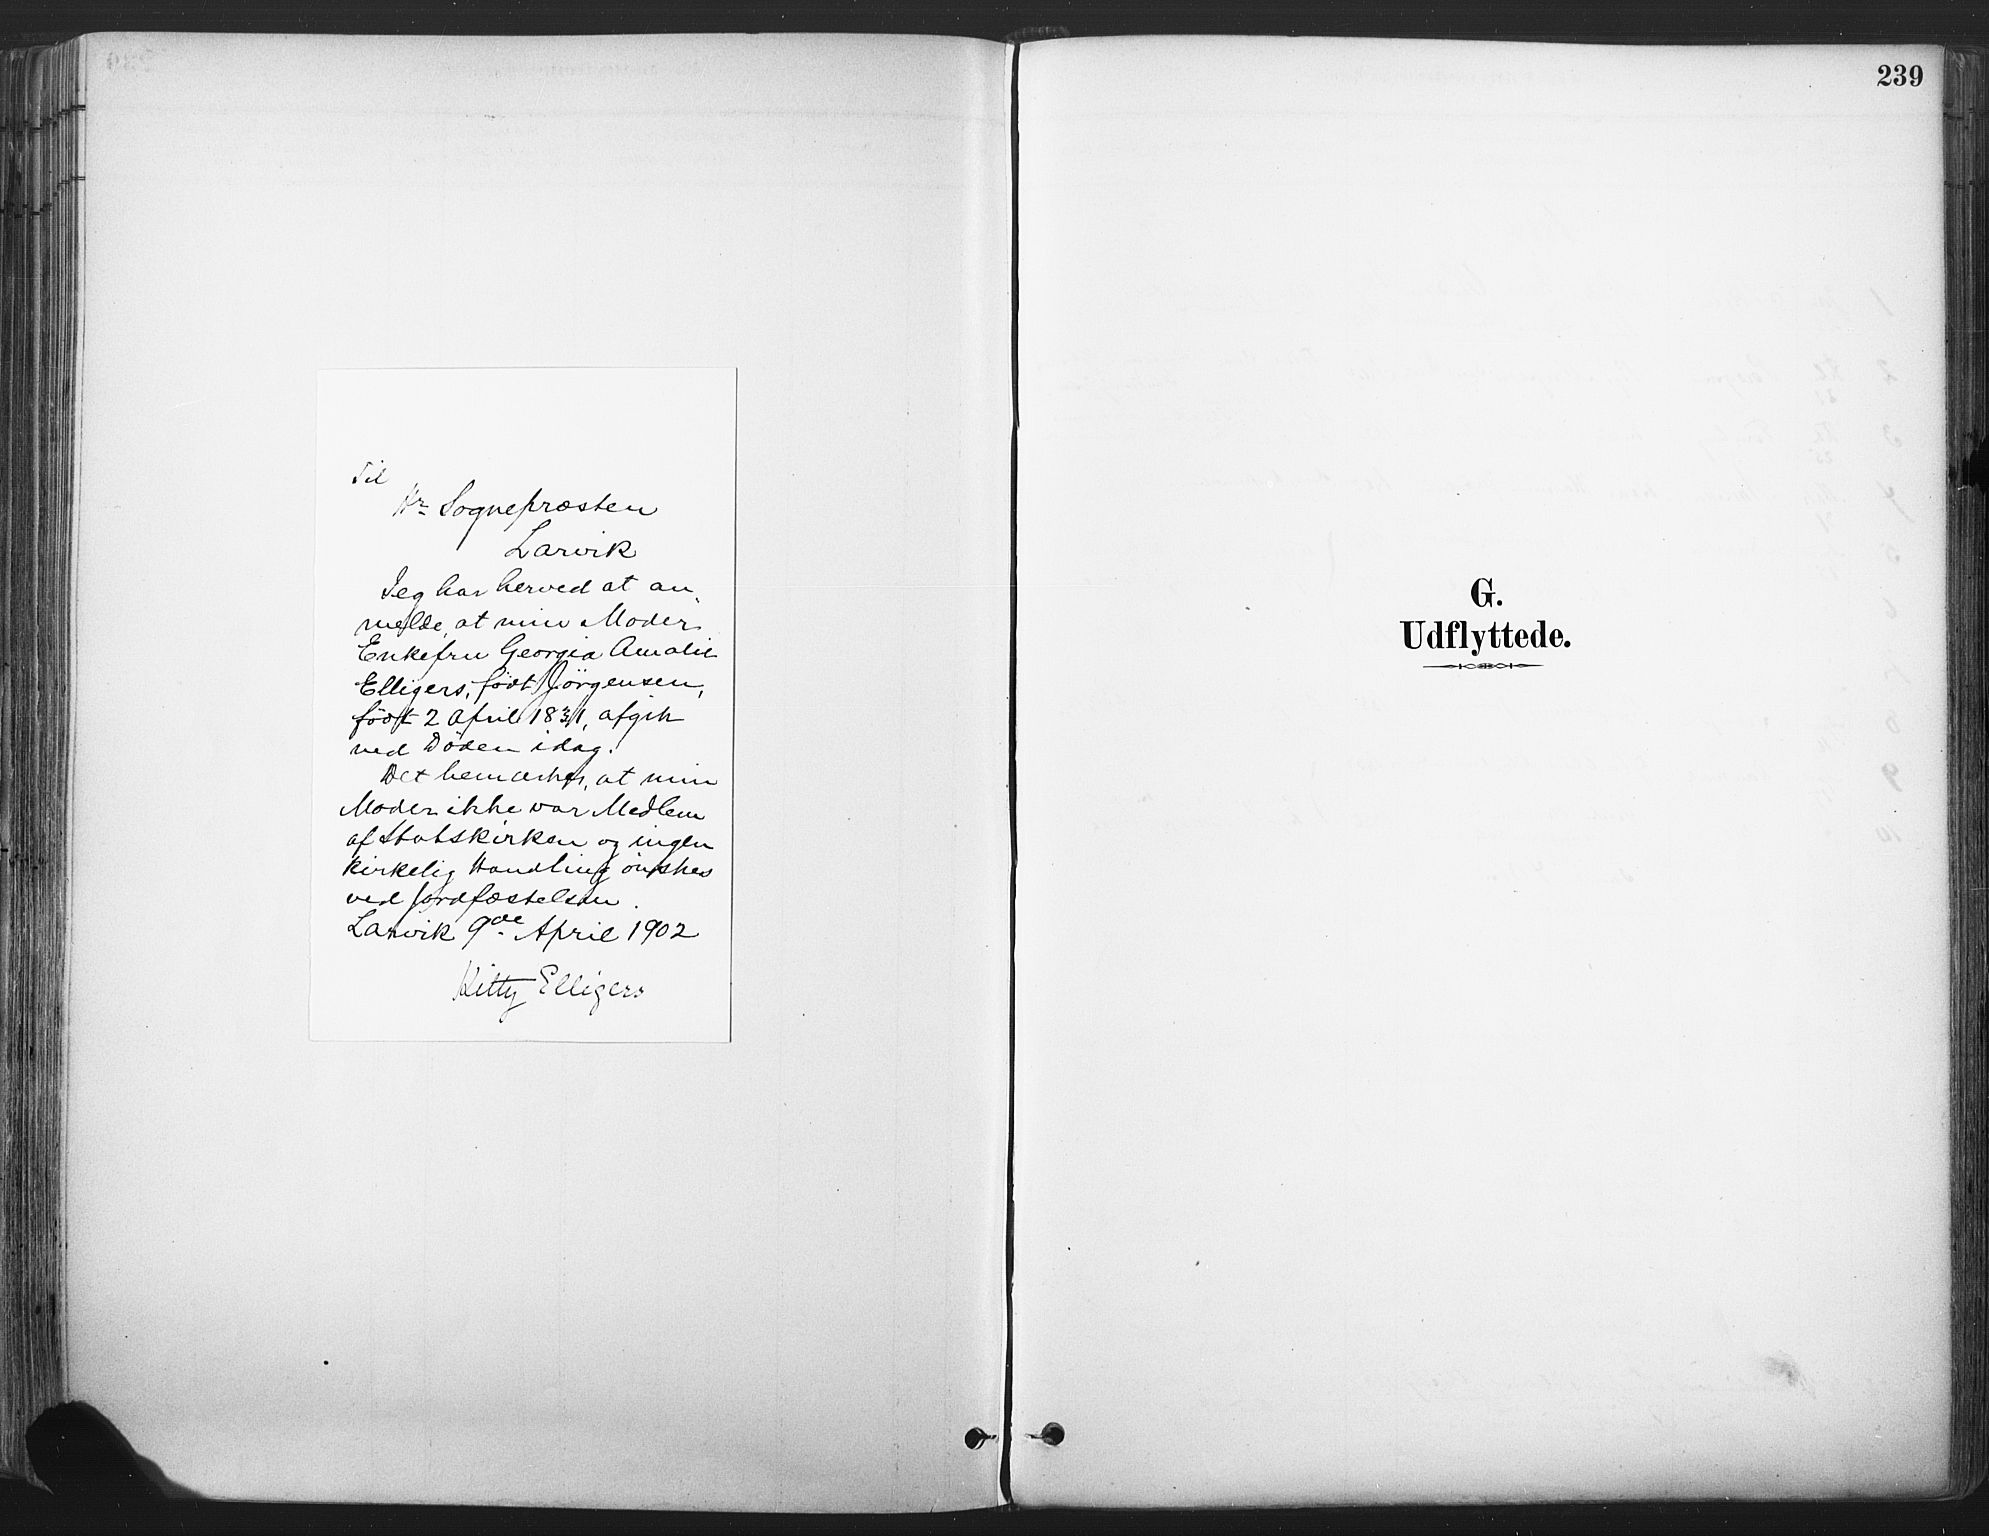 SAKO, Larvik kirkebøker, F/Fa/L0010: Ministerialbok nr. I 10, 1884-1910, s. 239